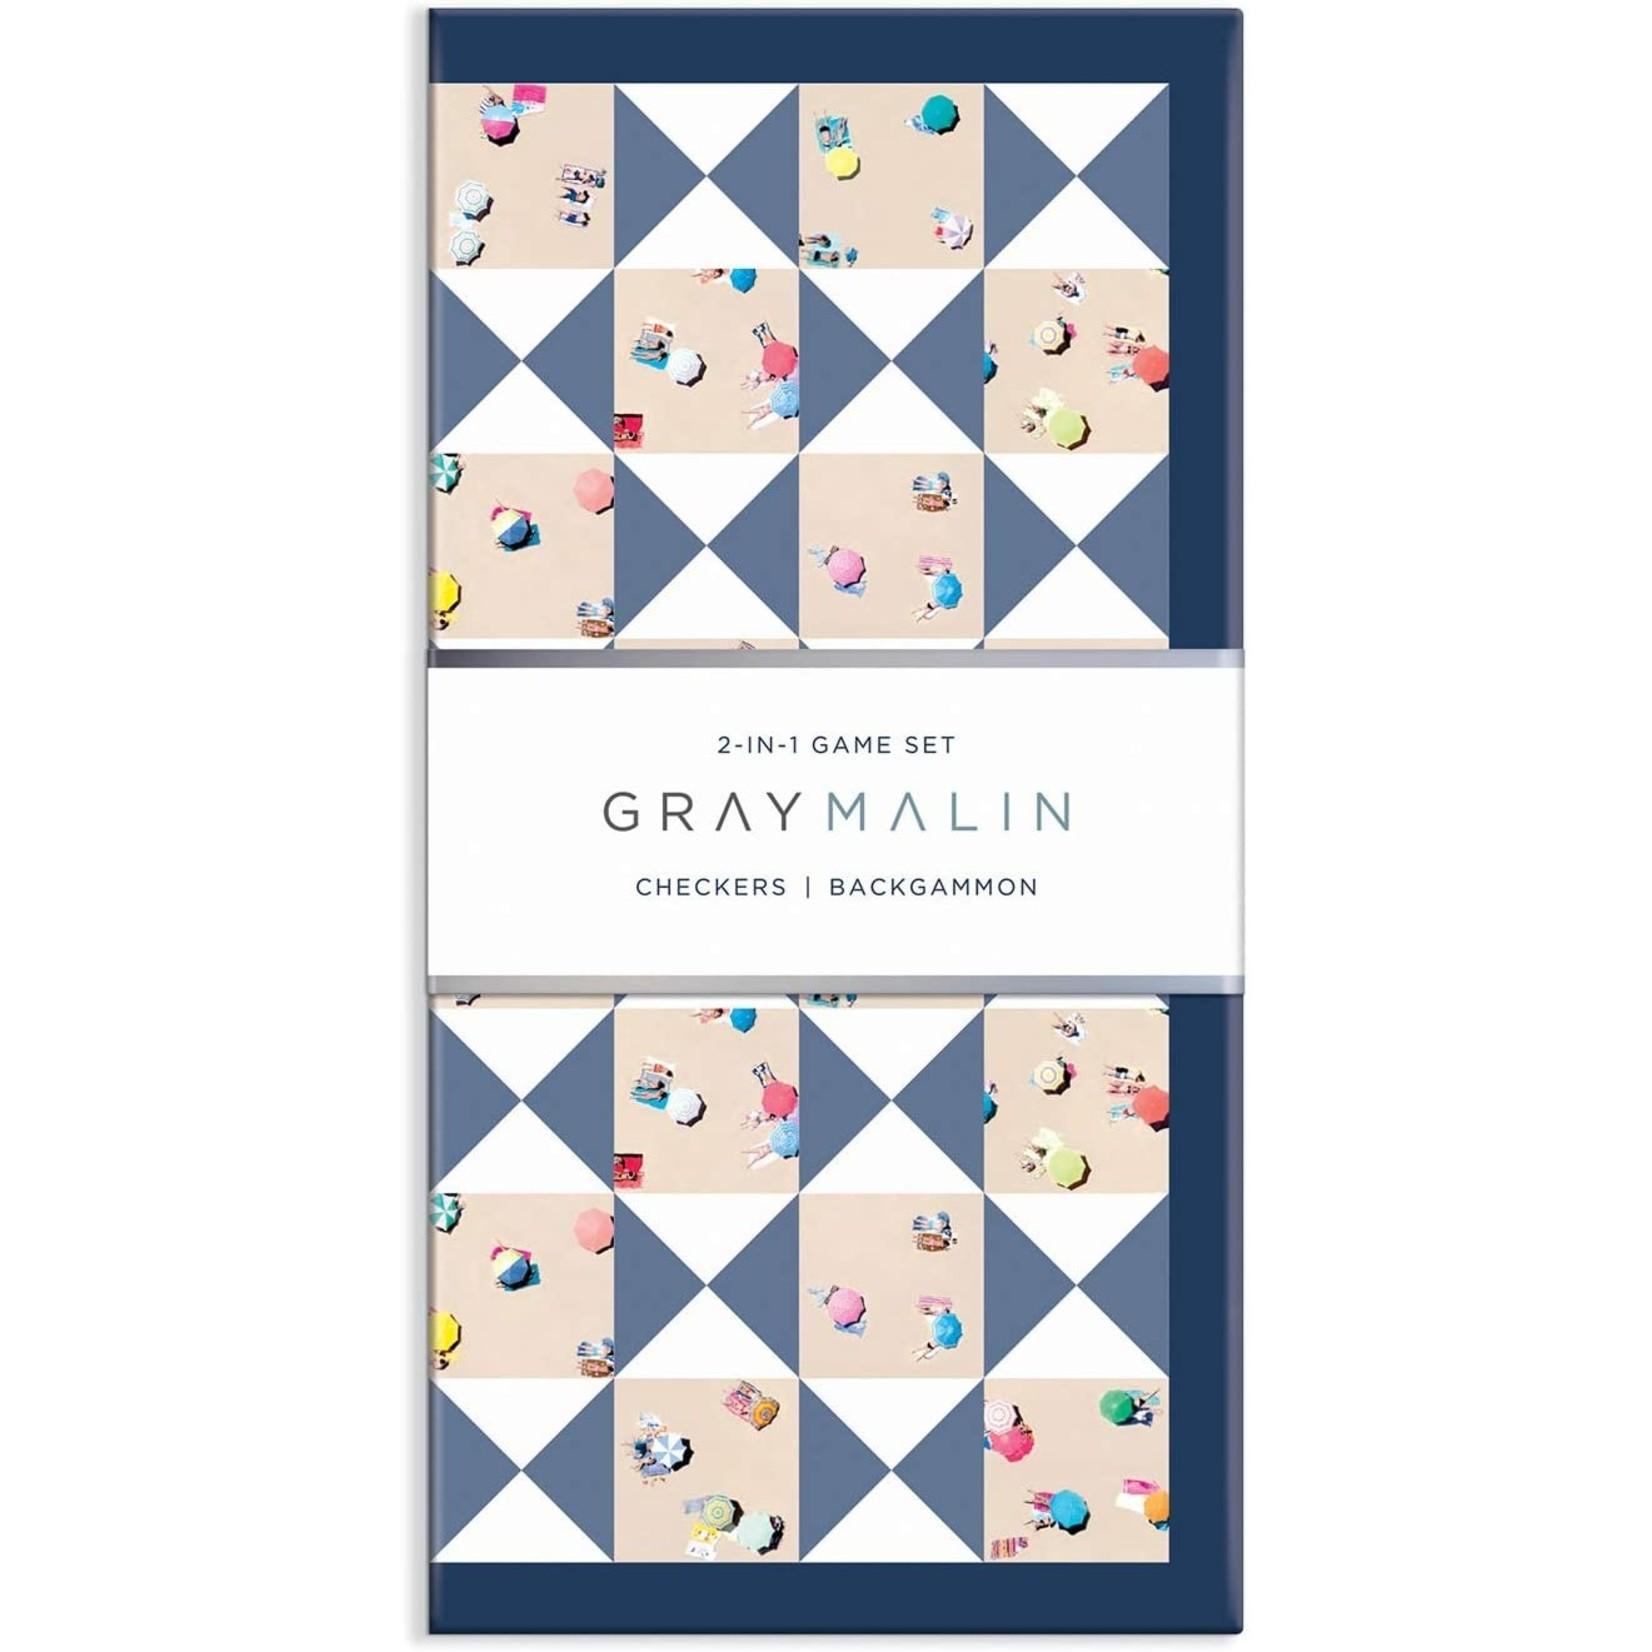 Chronicle Books Gray Malin 2-in-1 Checkers/Backgammon